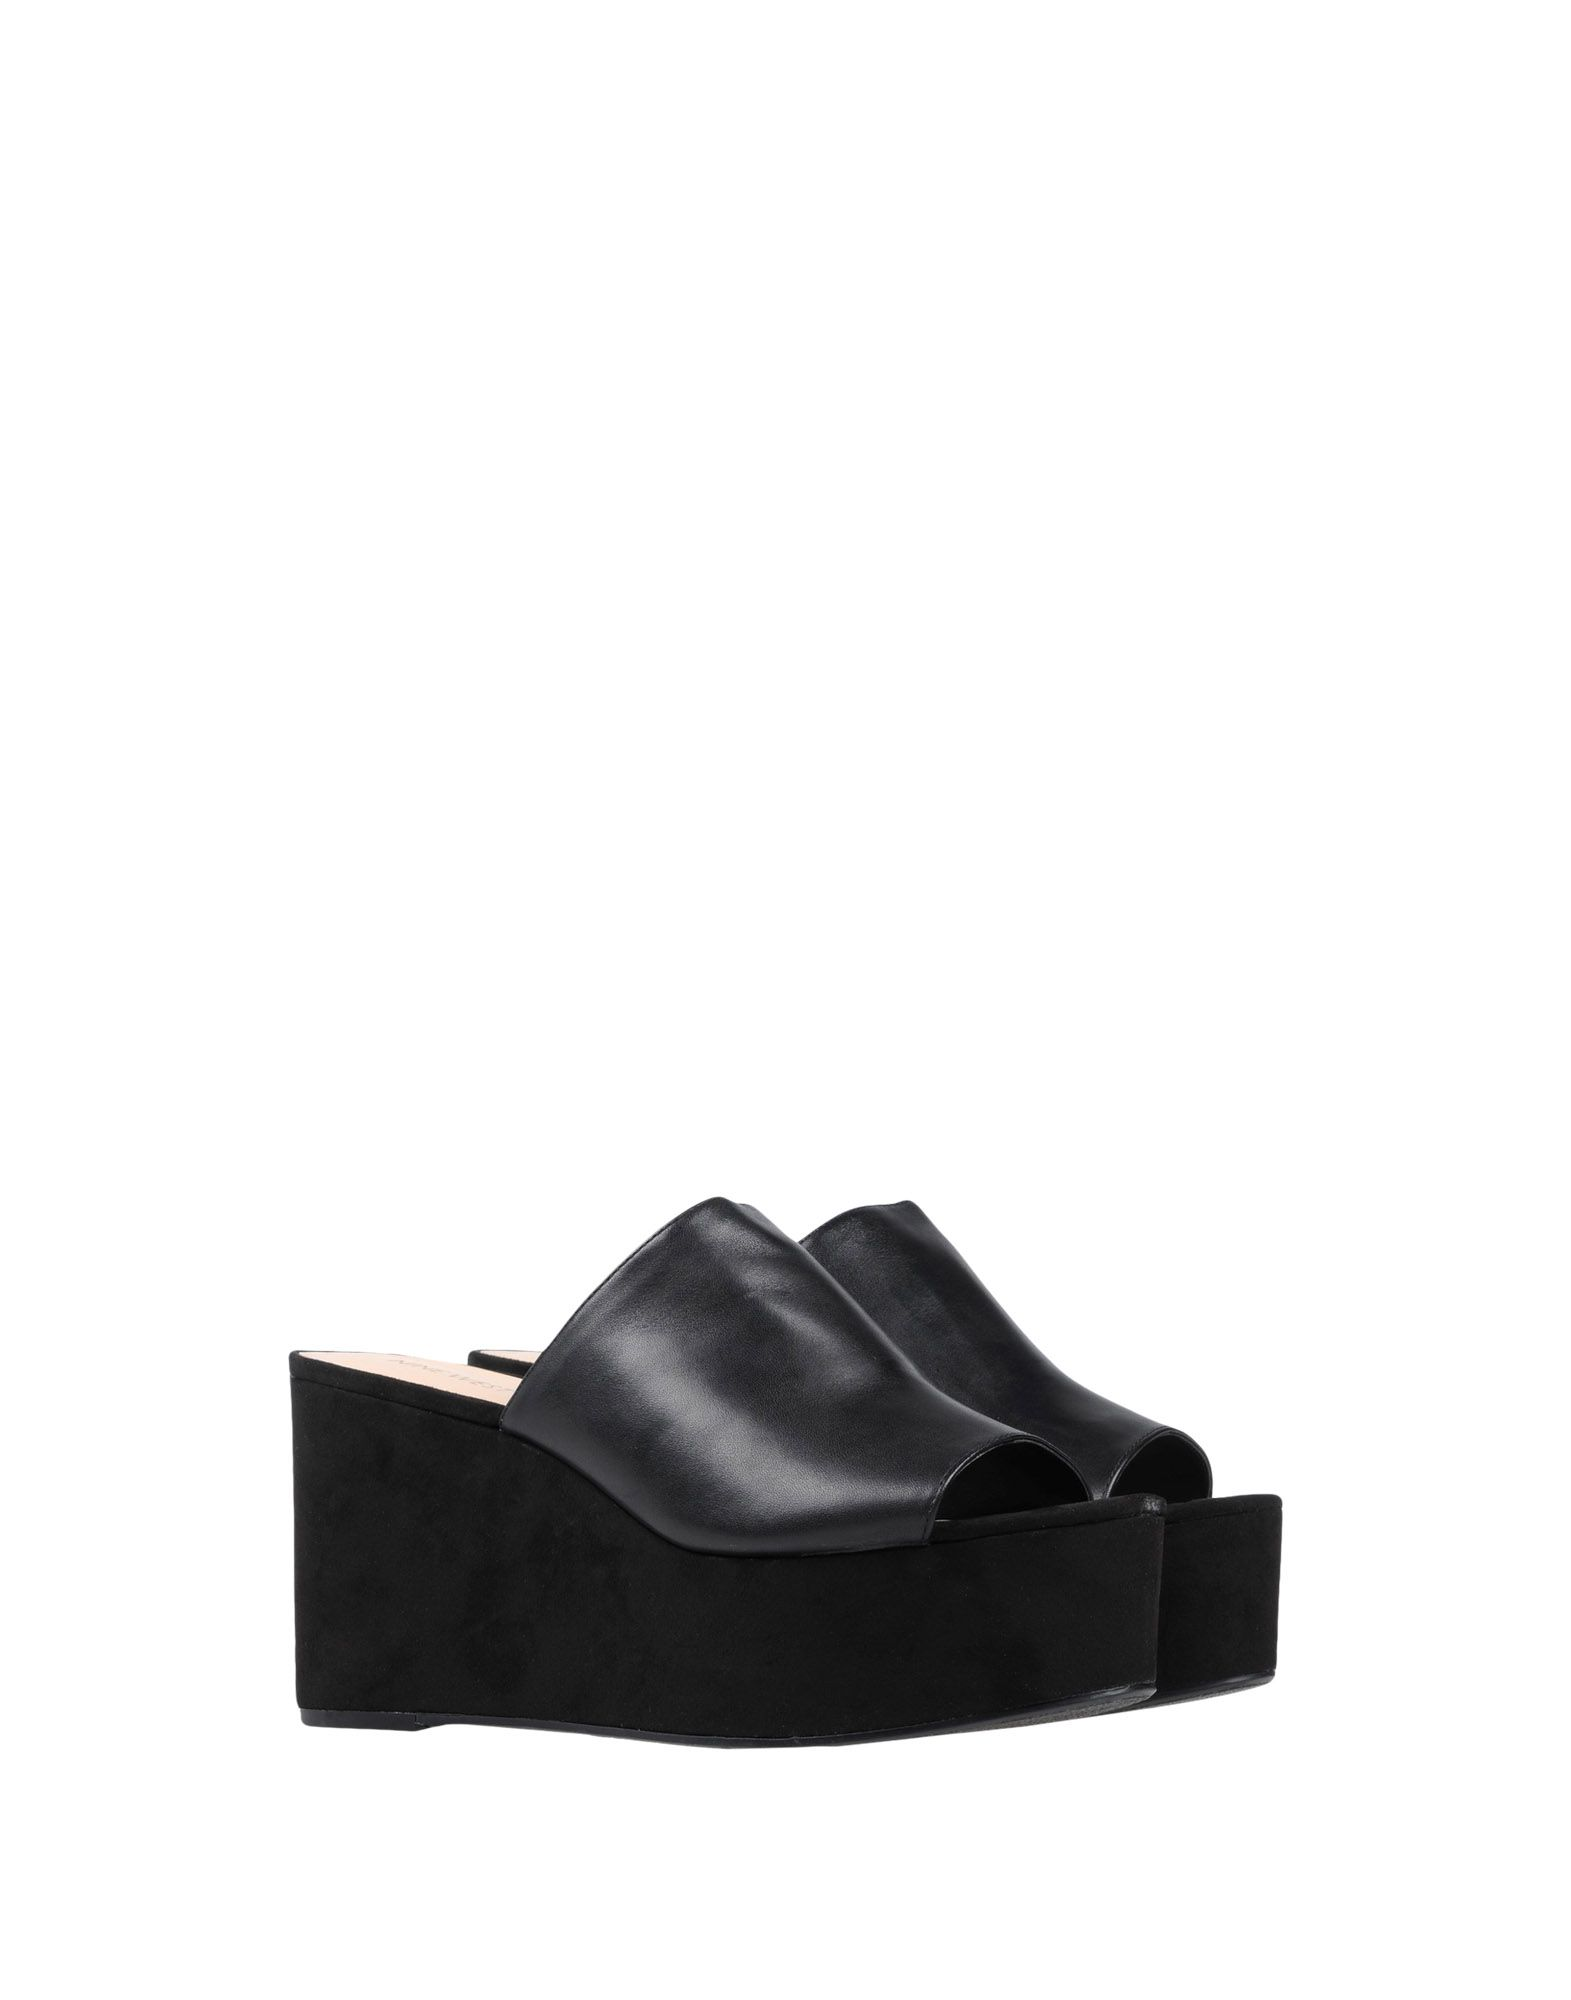 Nine West Sandalen Qualität Damen  11444763QV Gute Qualität Sandalen beliebte Schuhe 0330ba